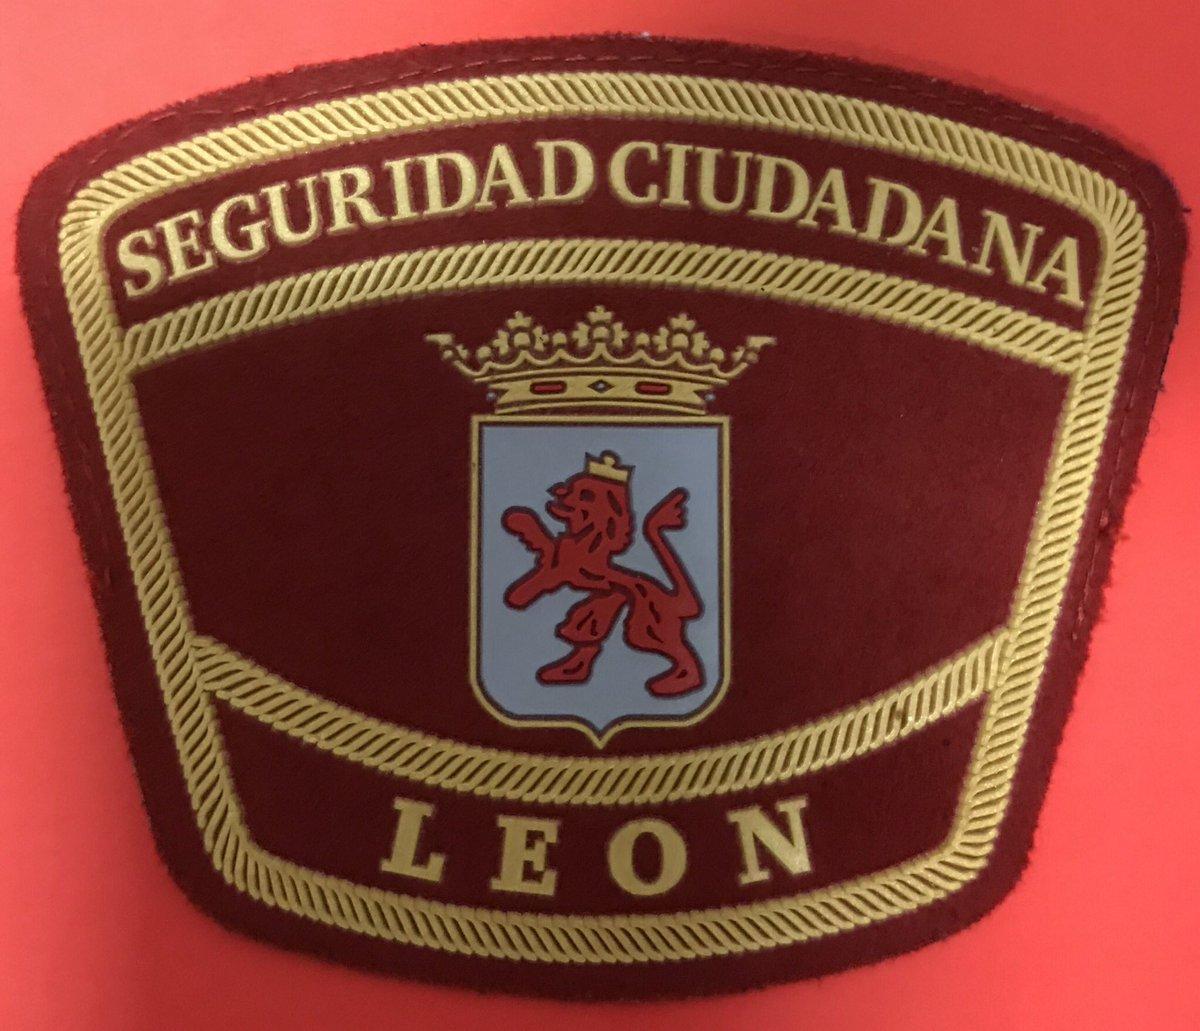 Leon seguridad ciudadana